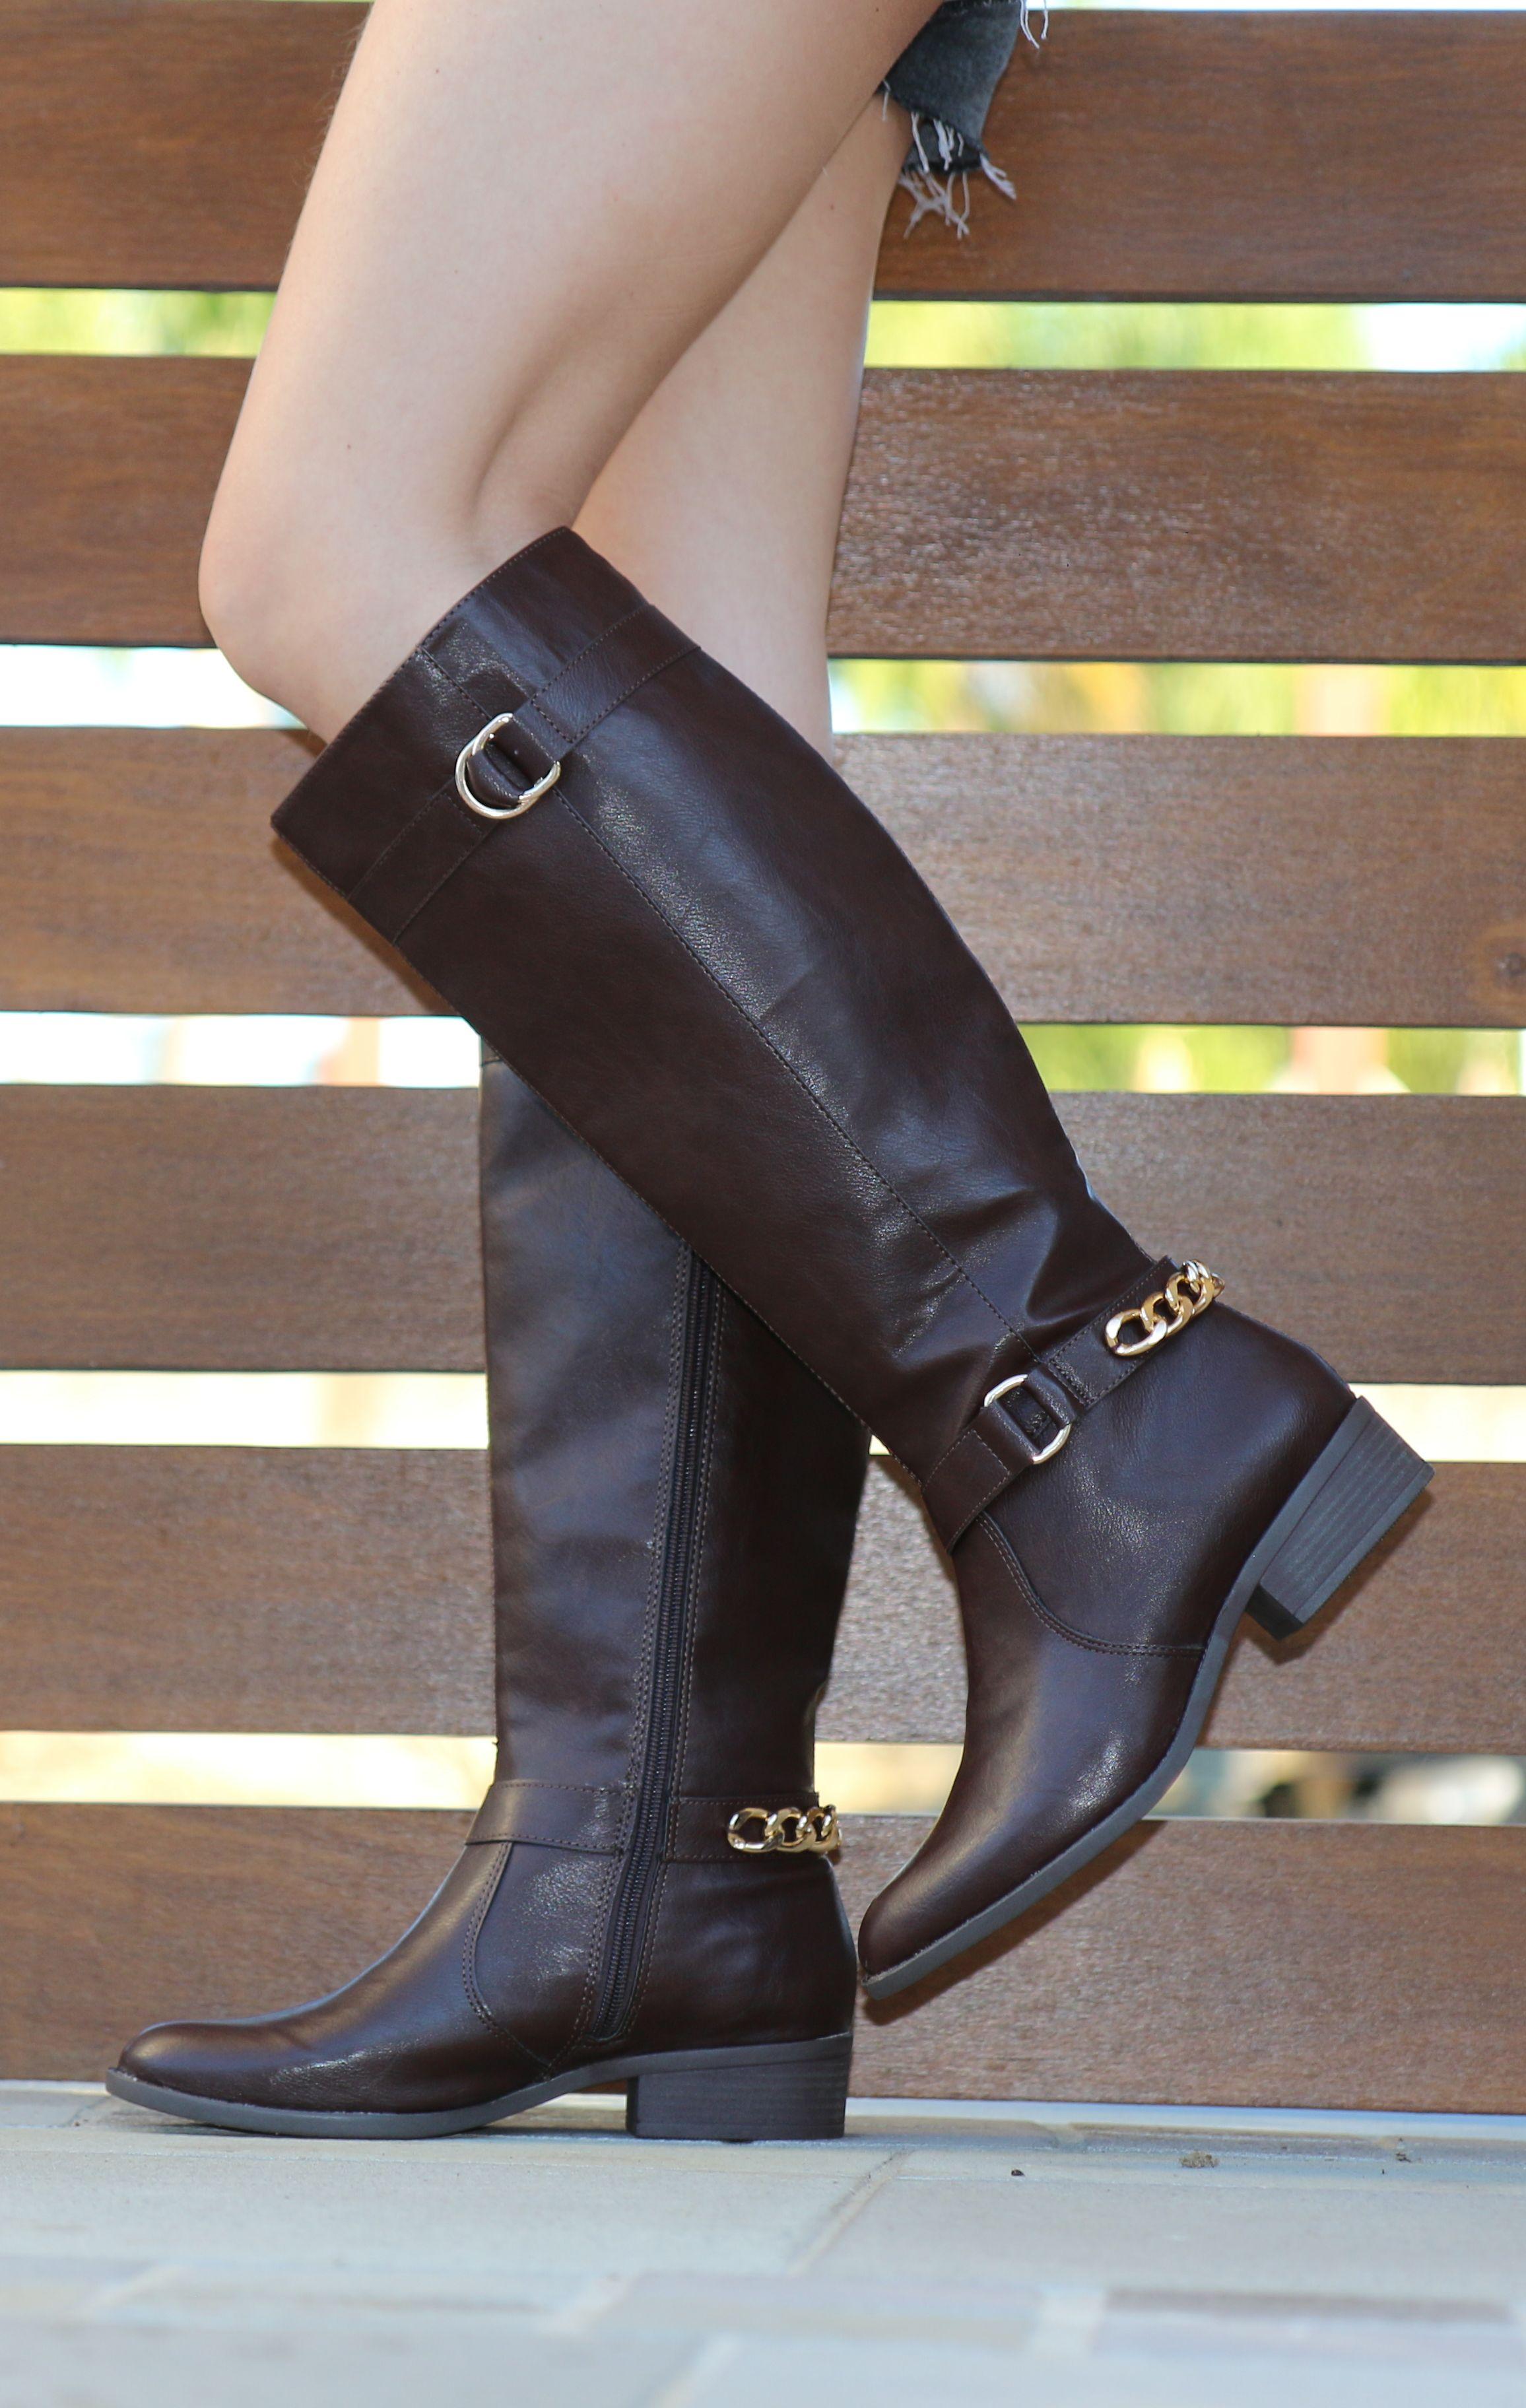 1669ec1af botas montaria - winter boots - marrom - Inverno 2015 - Ref. 15-1101 ...